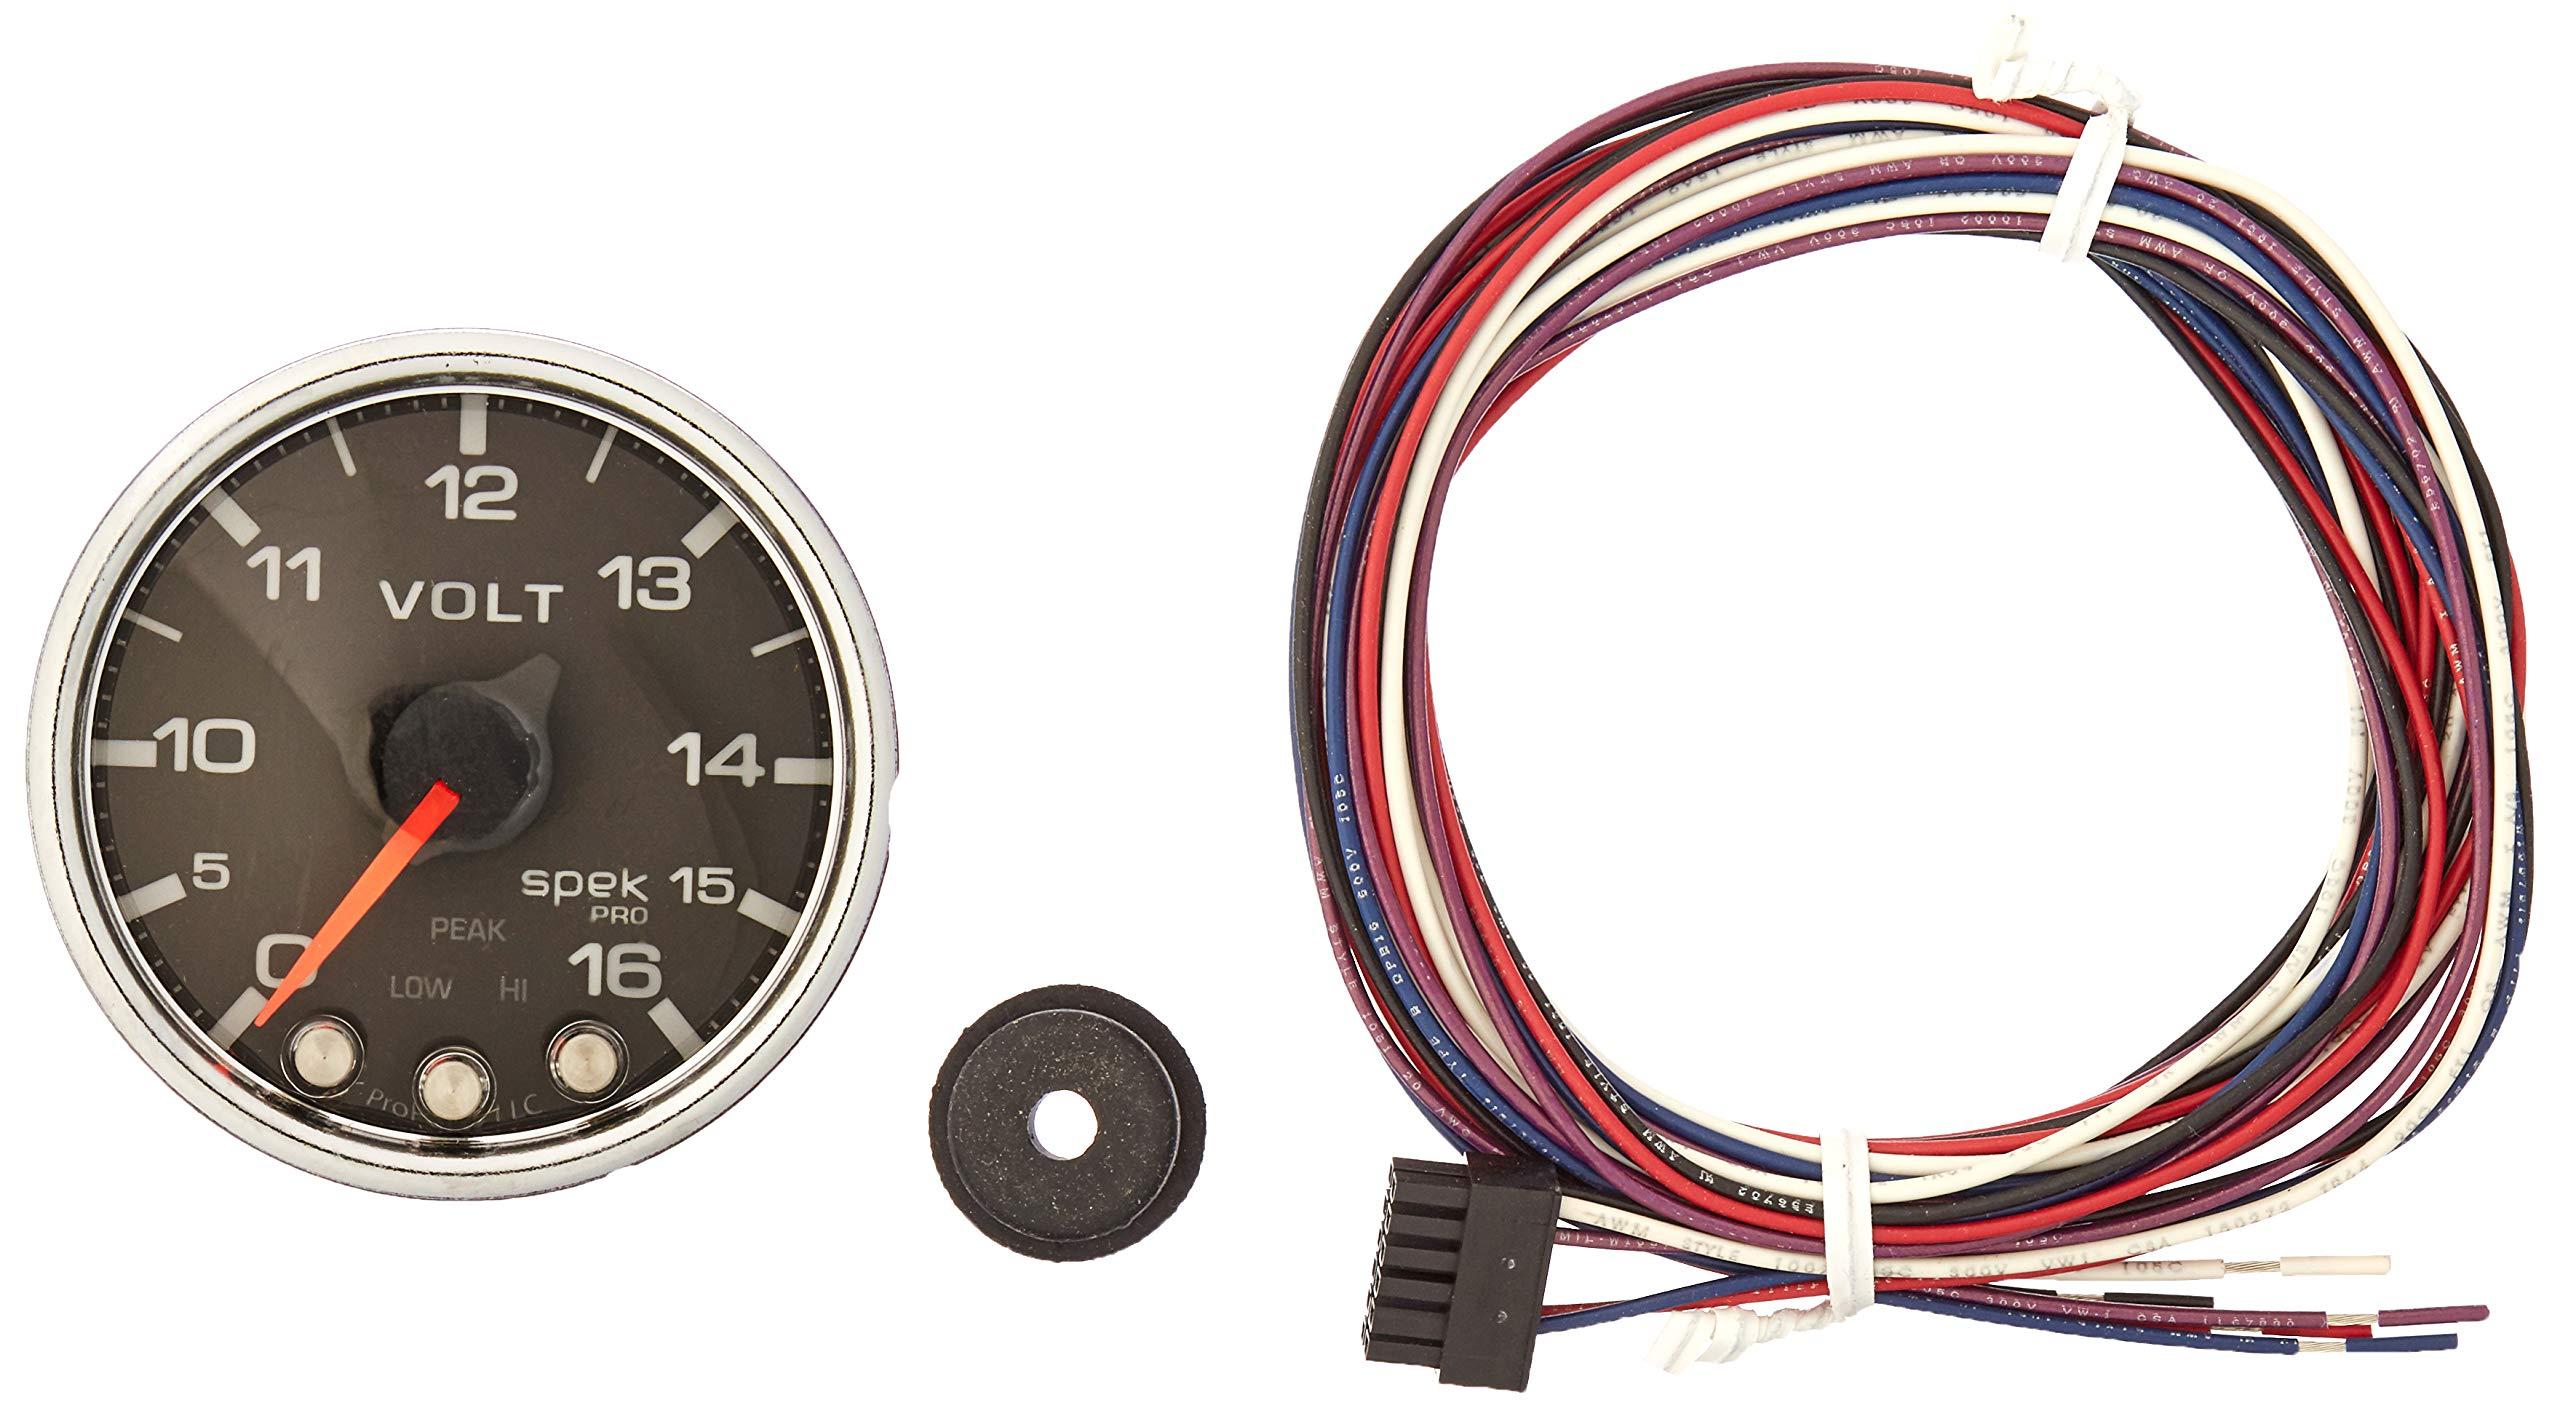 Auto Meter P34431 Gauge, Voltmeter, 2 1/16'', 16V, Stepper Motor W/Peak & Warn, Blk/Chrm, Spek-Pro